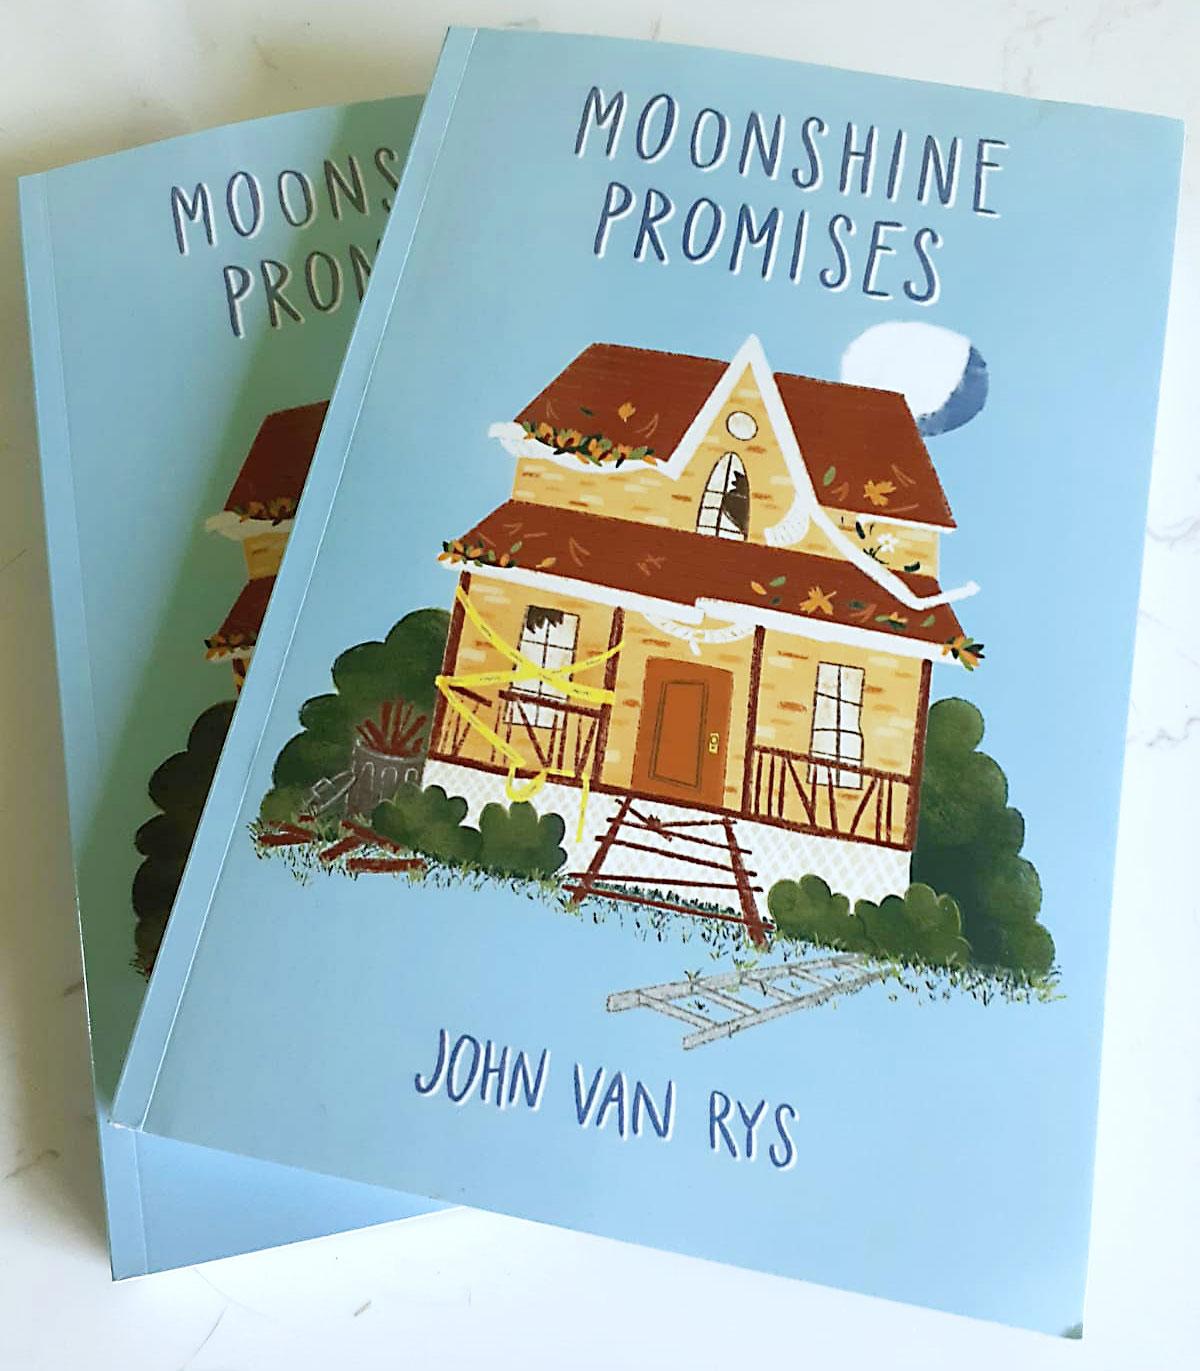 Author Copies of John Van Rys's novel Moonshine Promises